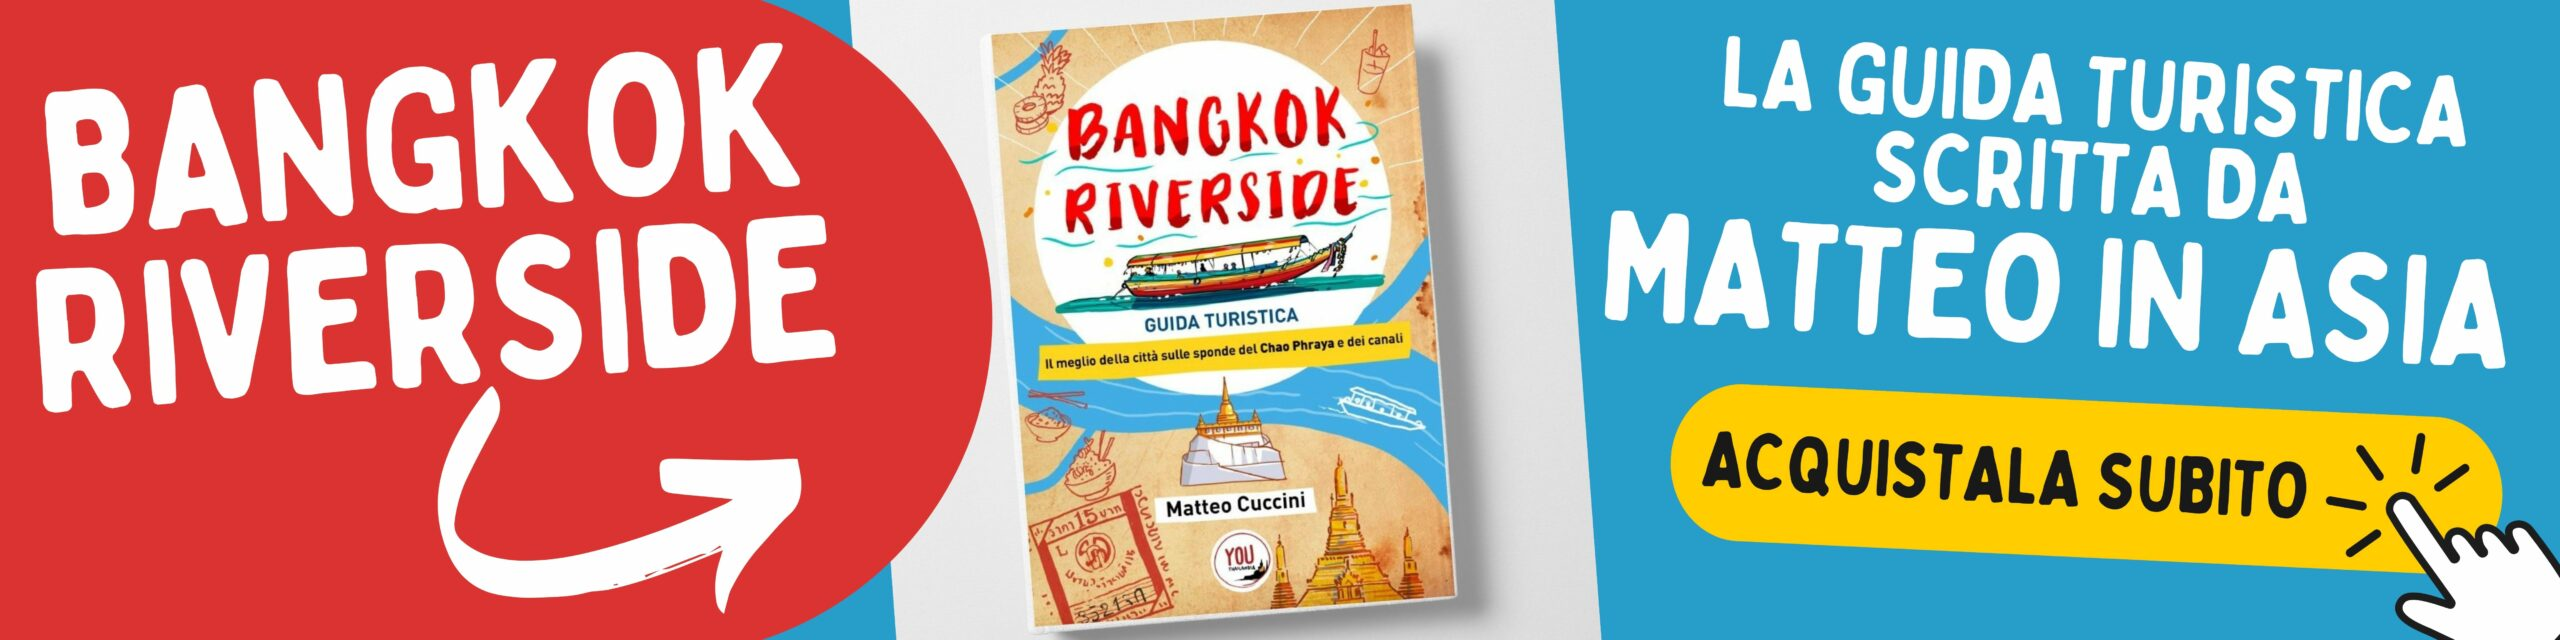 bangkok riverside guida turistica